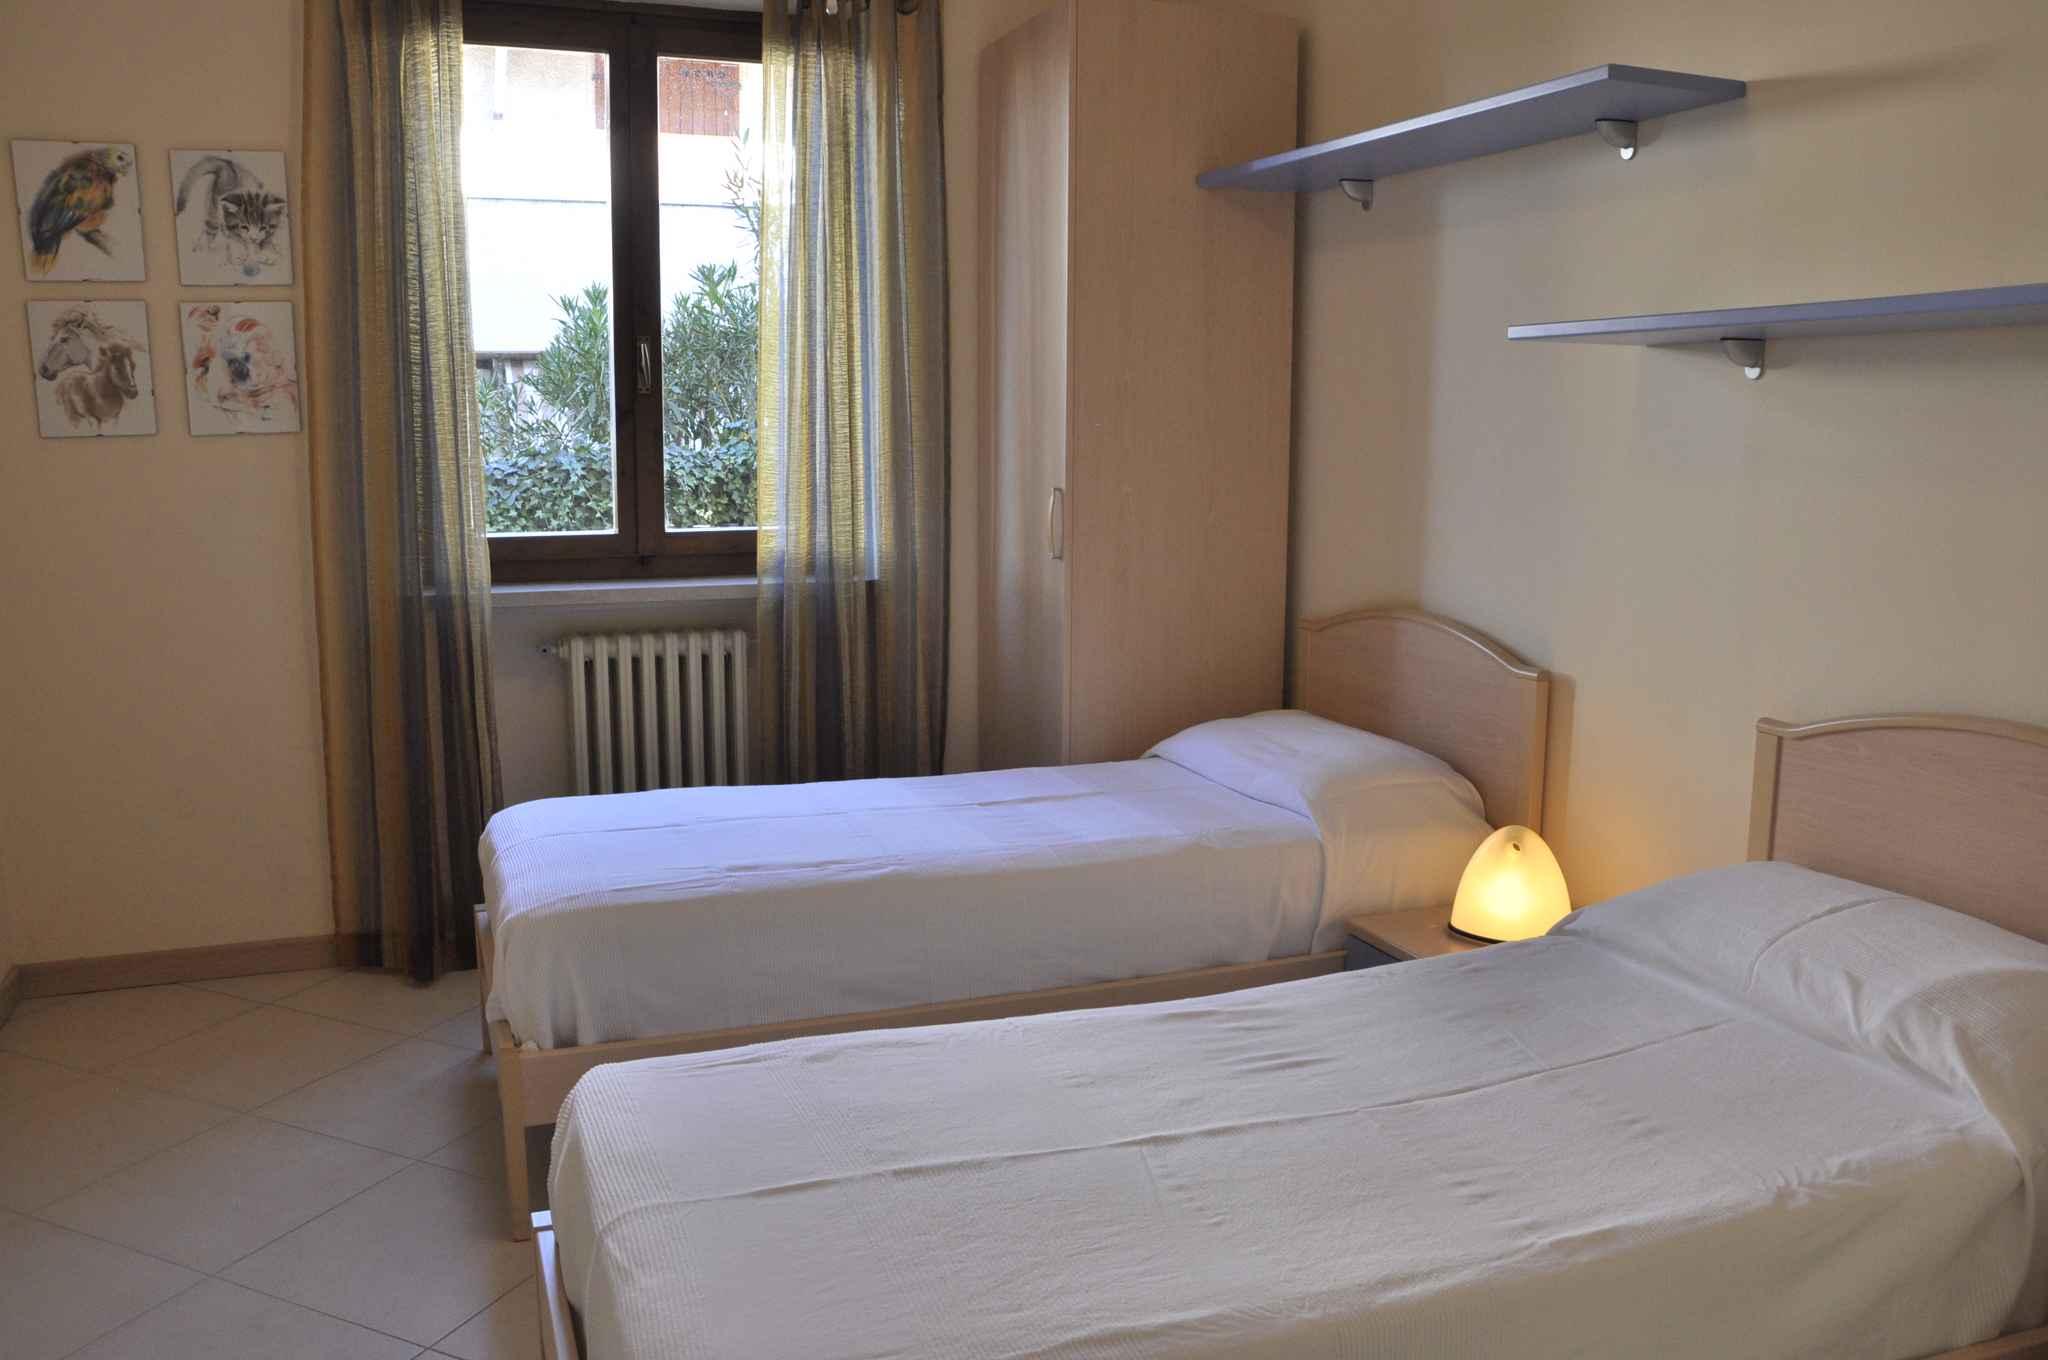 Ferienwohnung con piscina esterna (279596), Lazise, Gardasee, Venetien, Italien, Bild 21